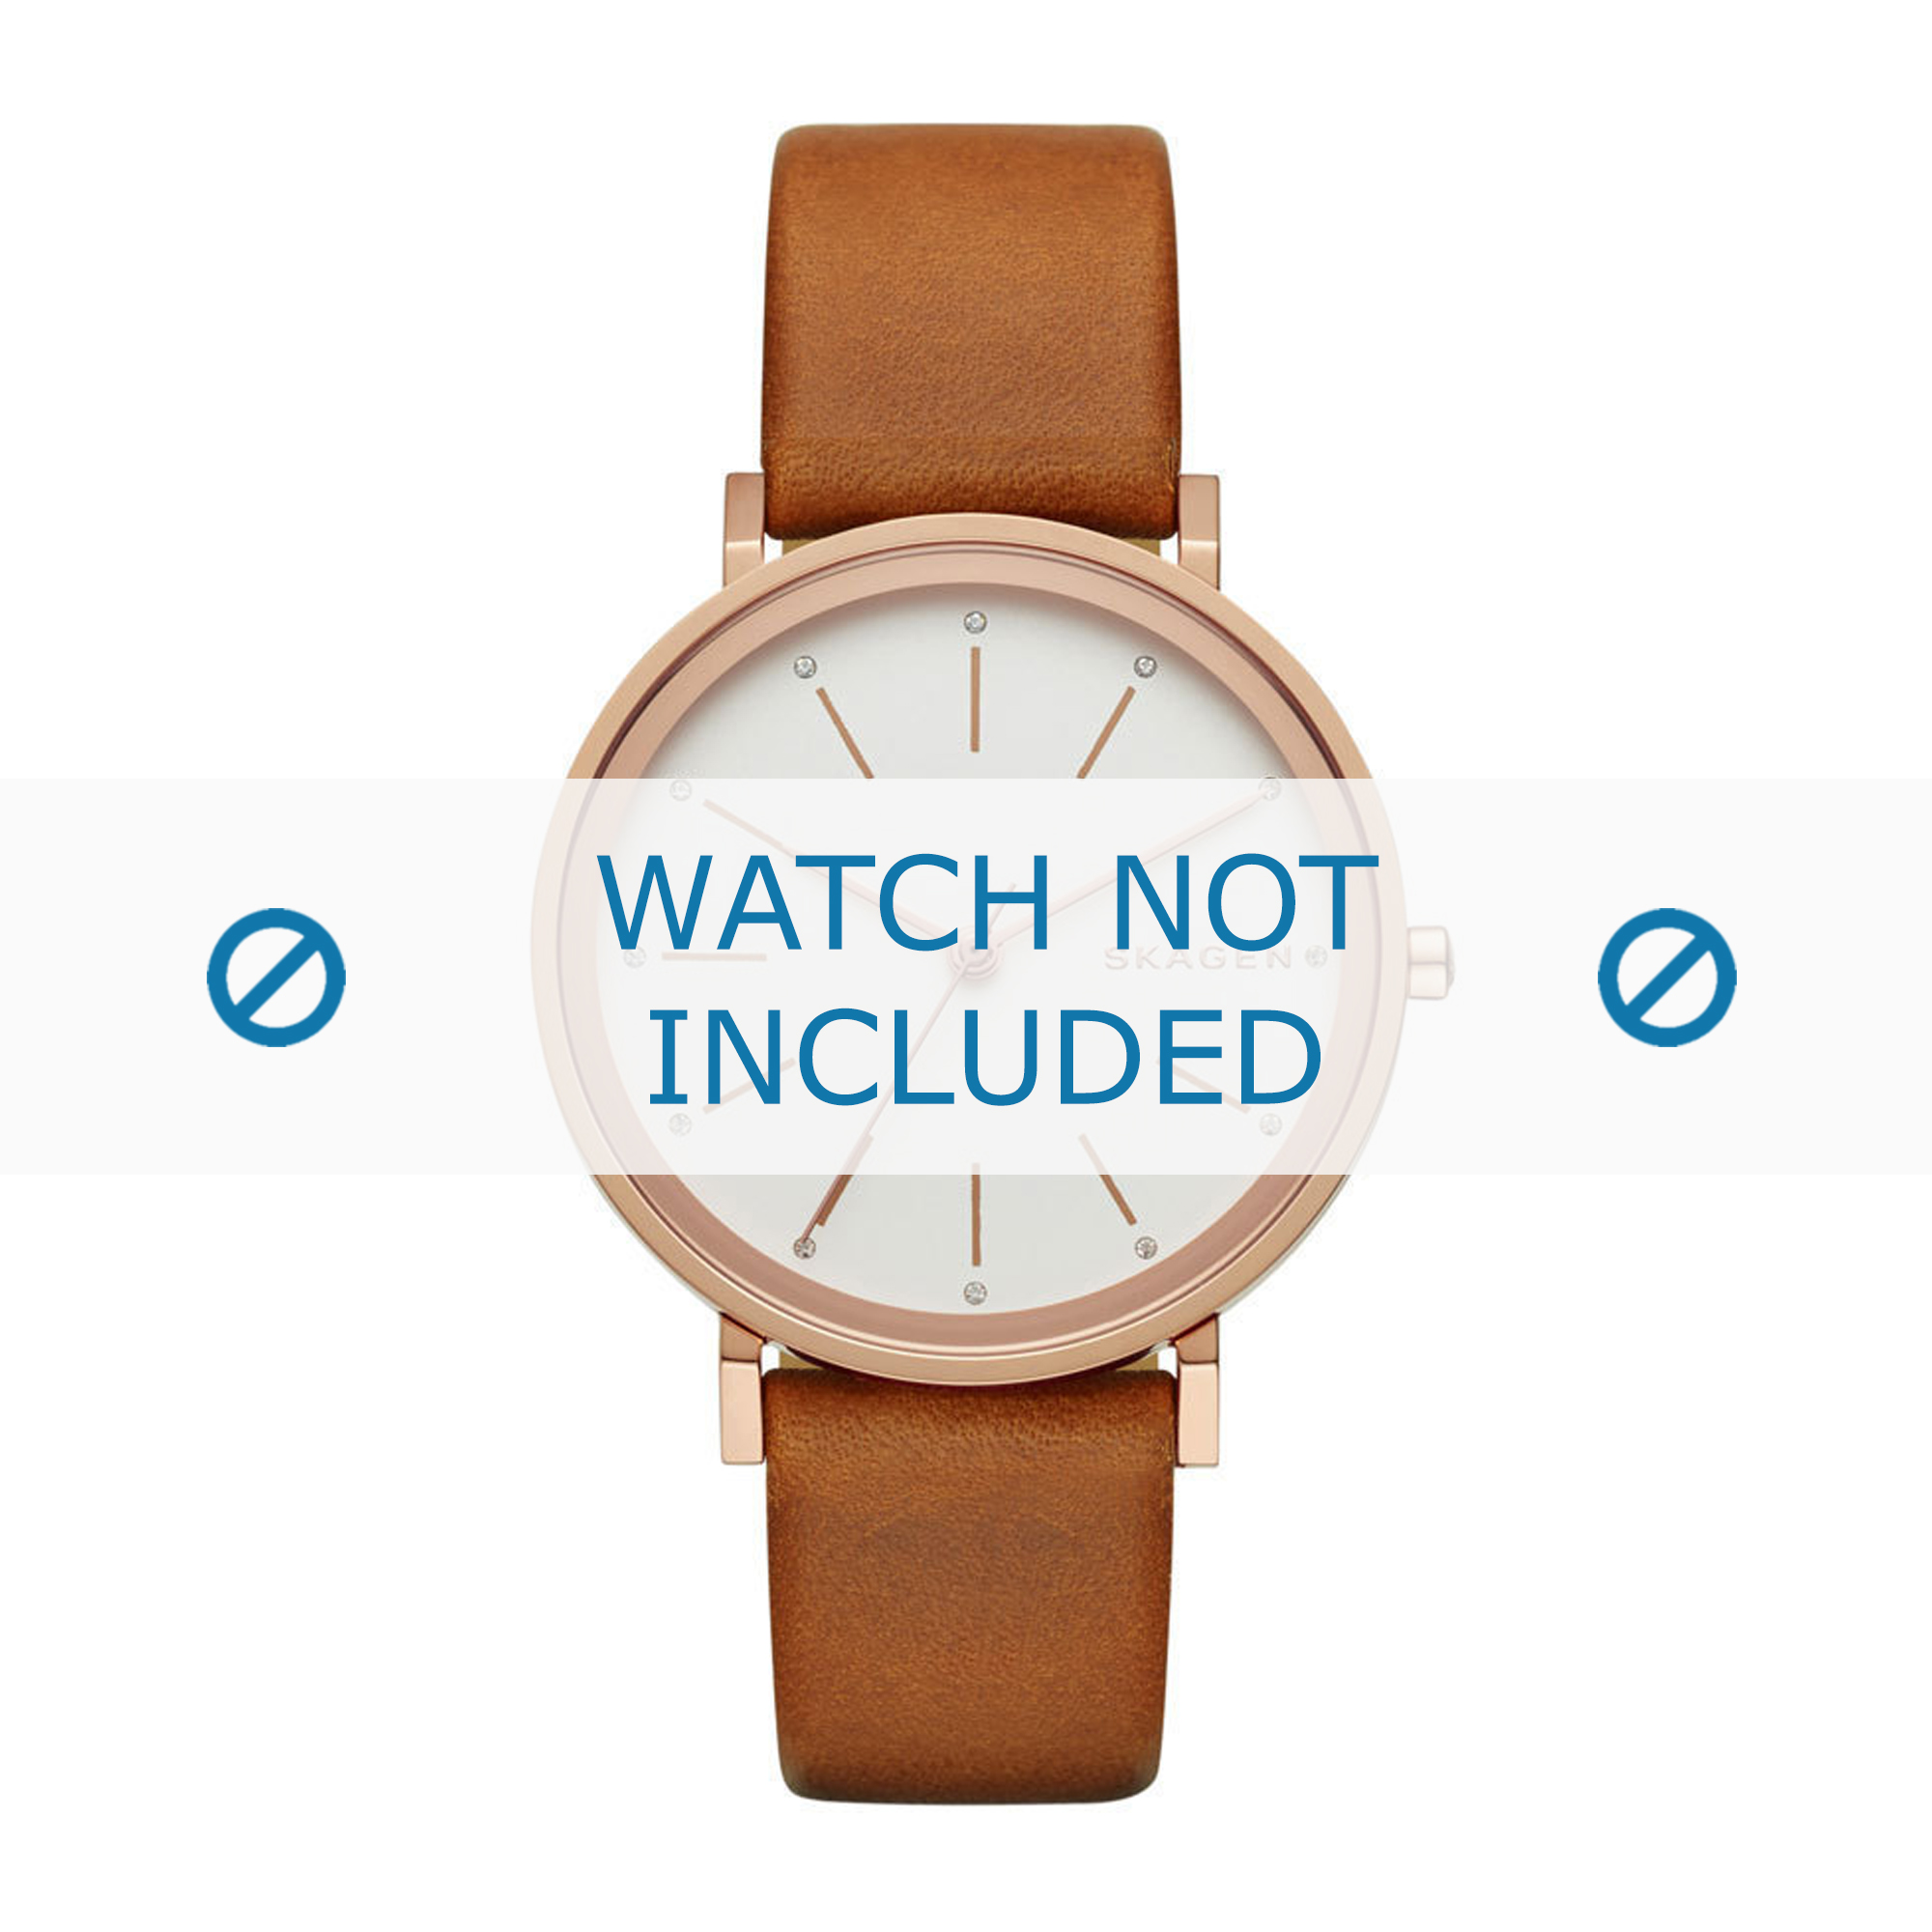 807a4e50a70 skagen horloge kopen   Natuurlijk via HorlogeKopen